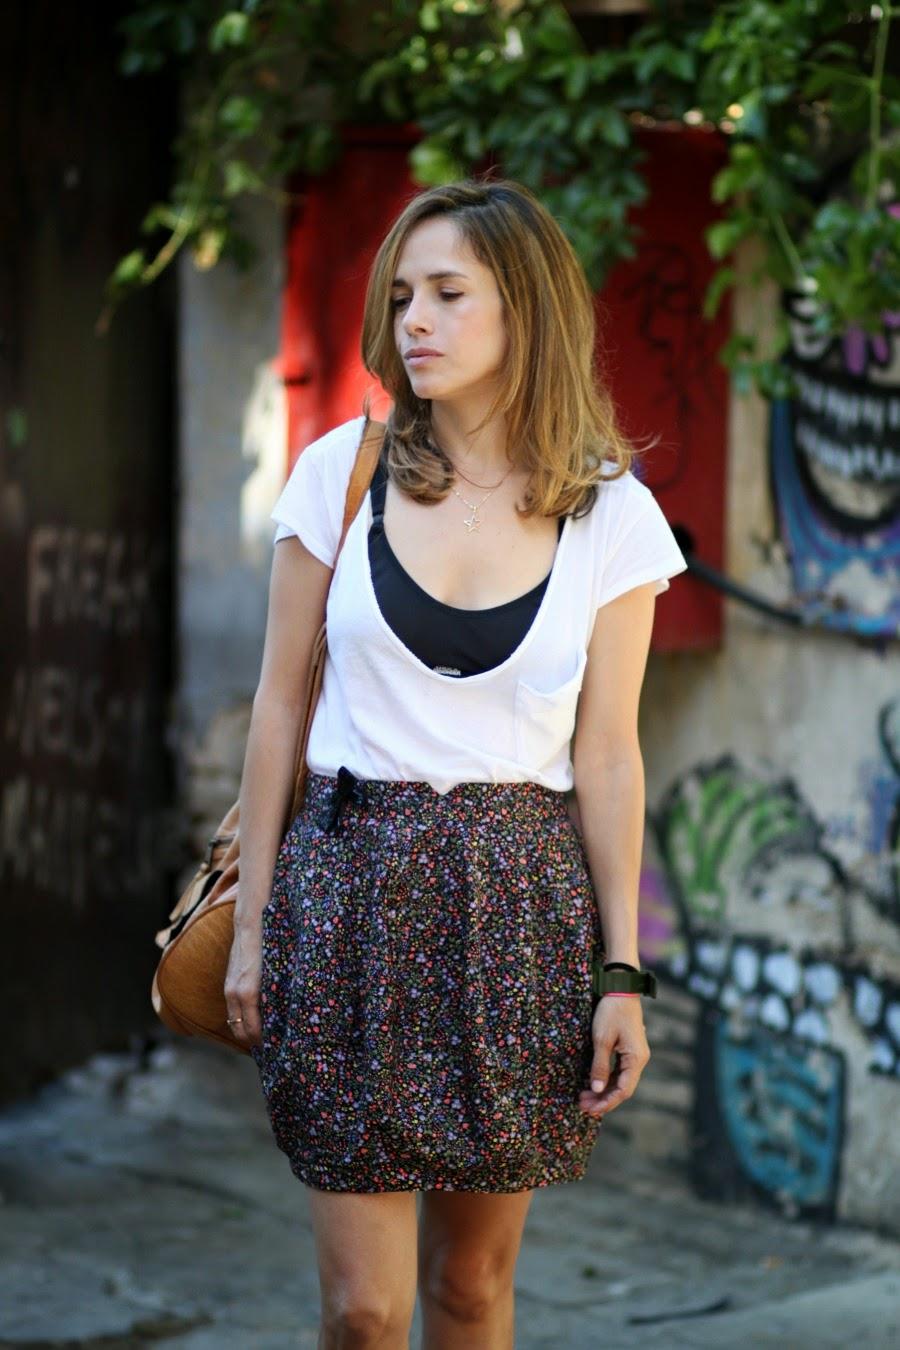 balloon, skirt, riverisland, sportybra, trend, newthing, fashionblog, streetstyle, אופנה, בלוגאופנה סטייל